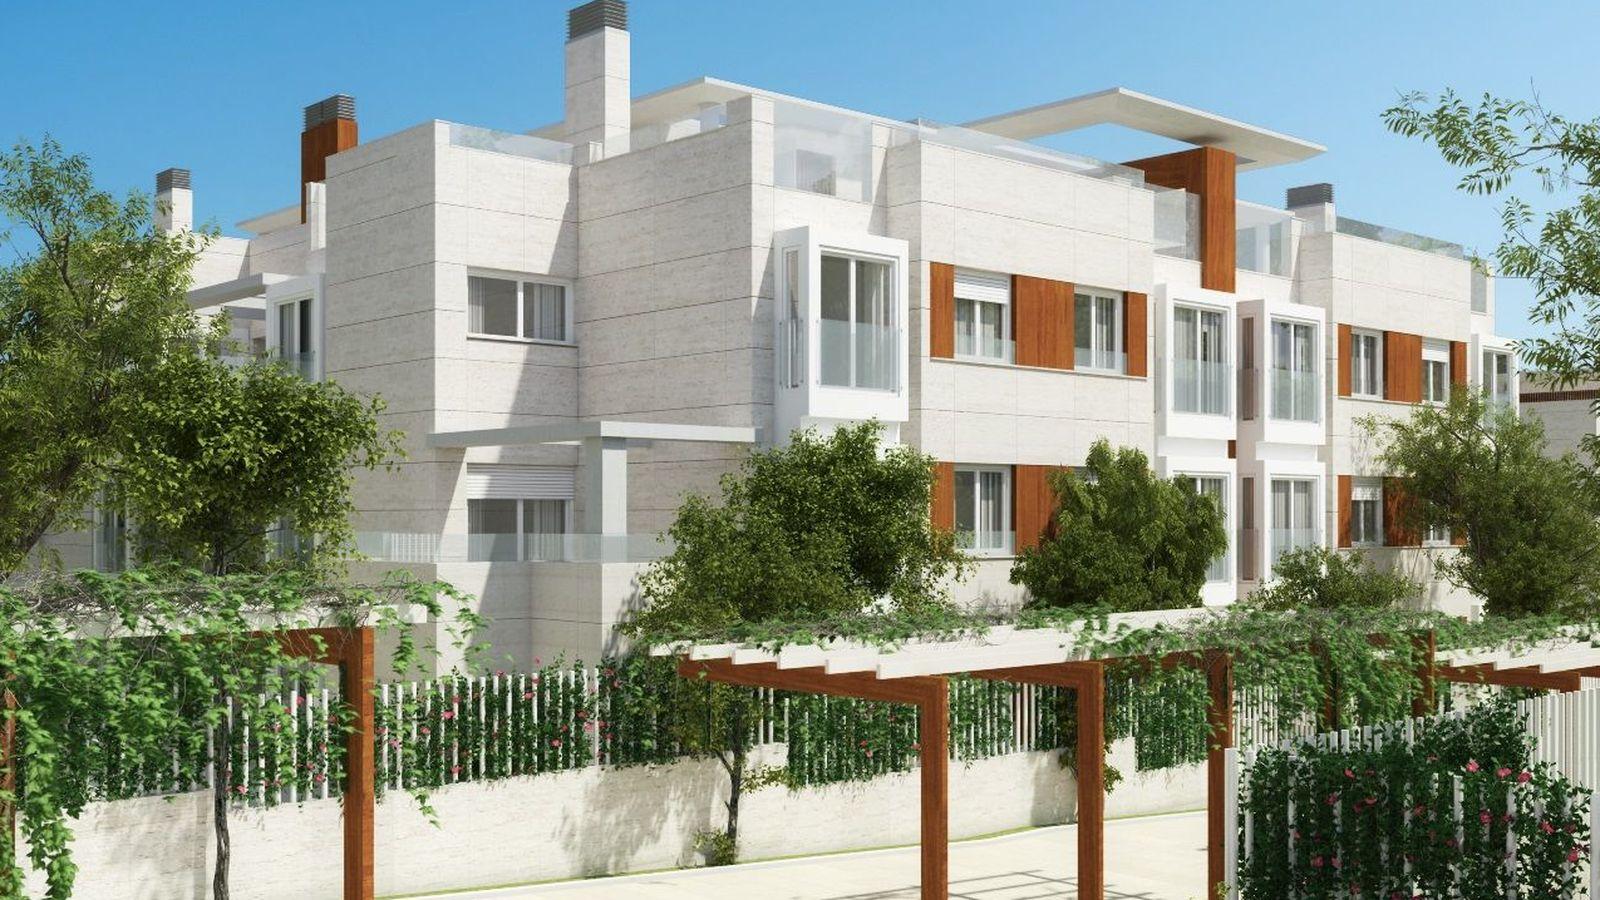 Foto: Aravaca Garden. Foto: Momentum Real Estate.